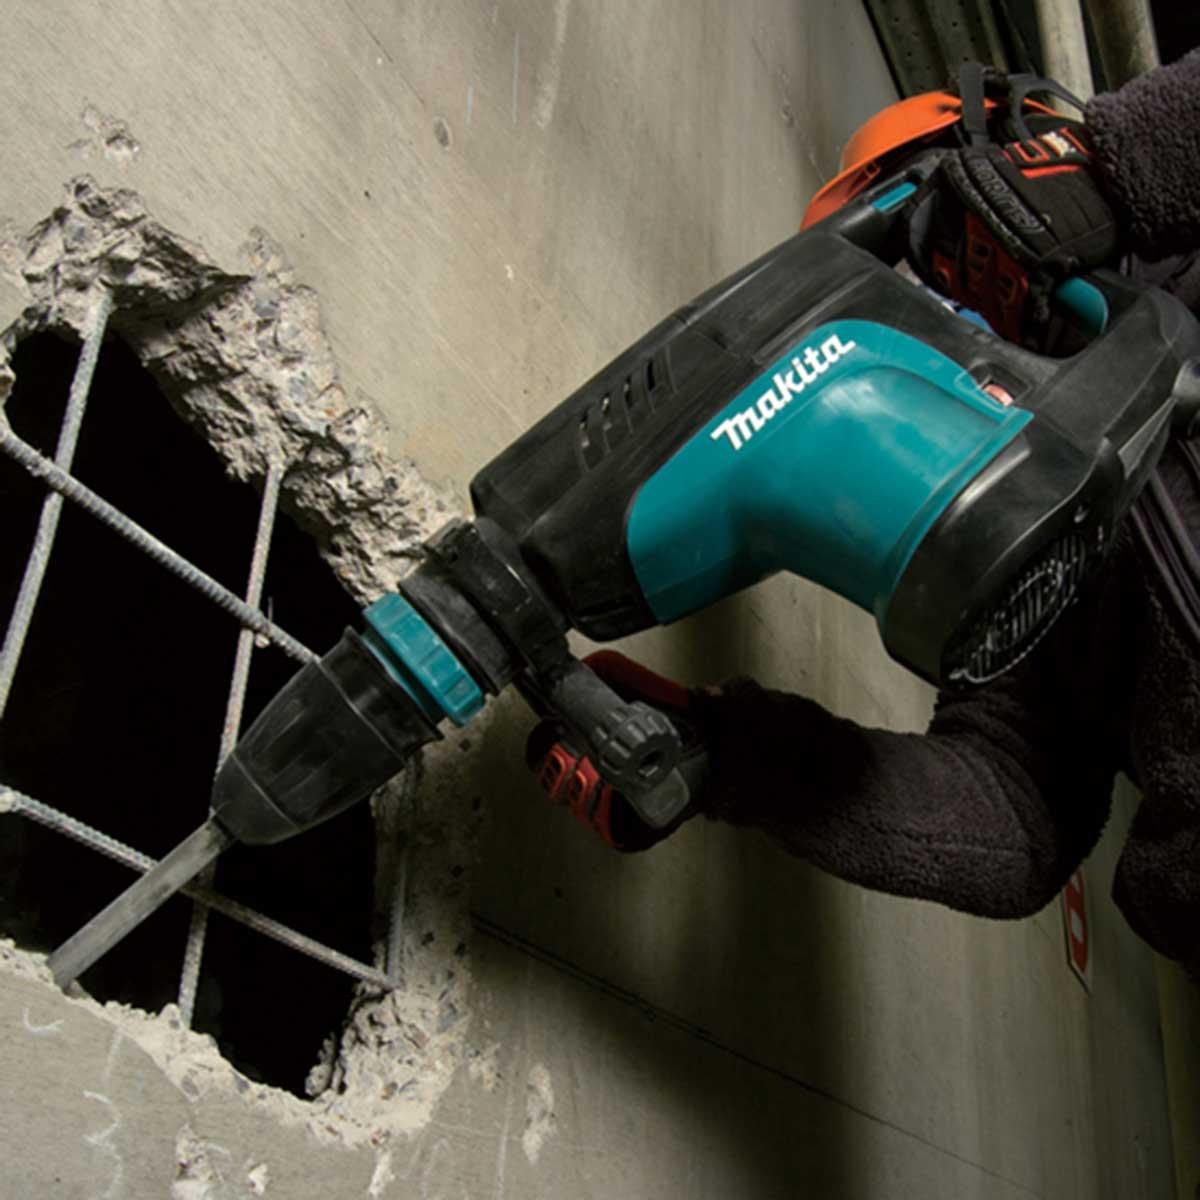 HM1203C Makita Demo Hammer wall